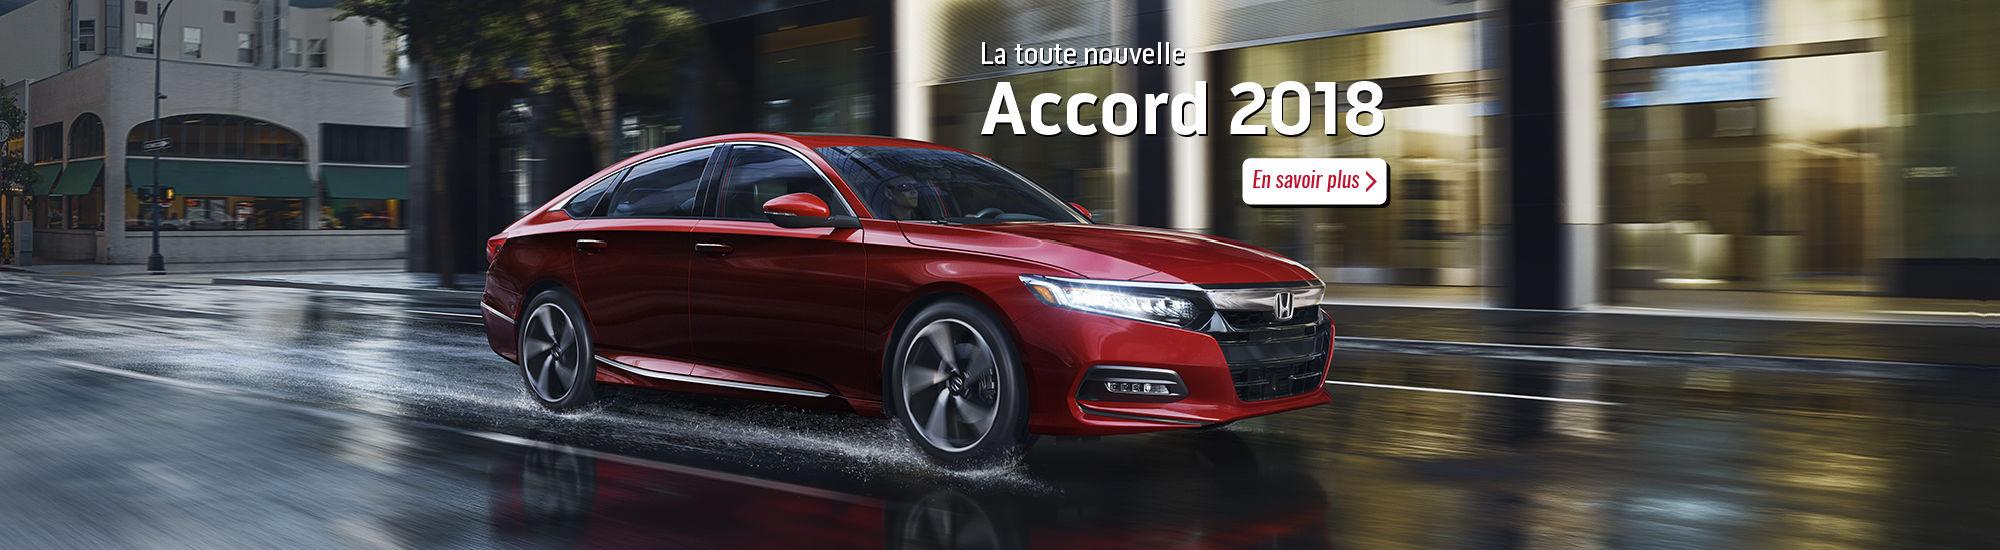 La toute nouvelle Honda Accord 2018